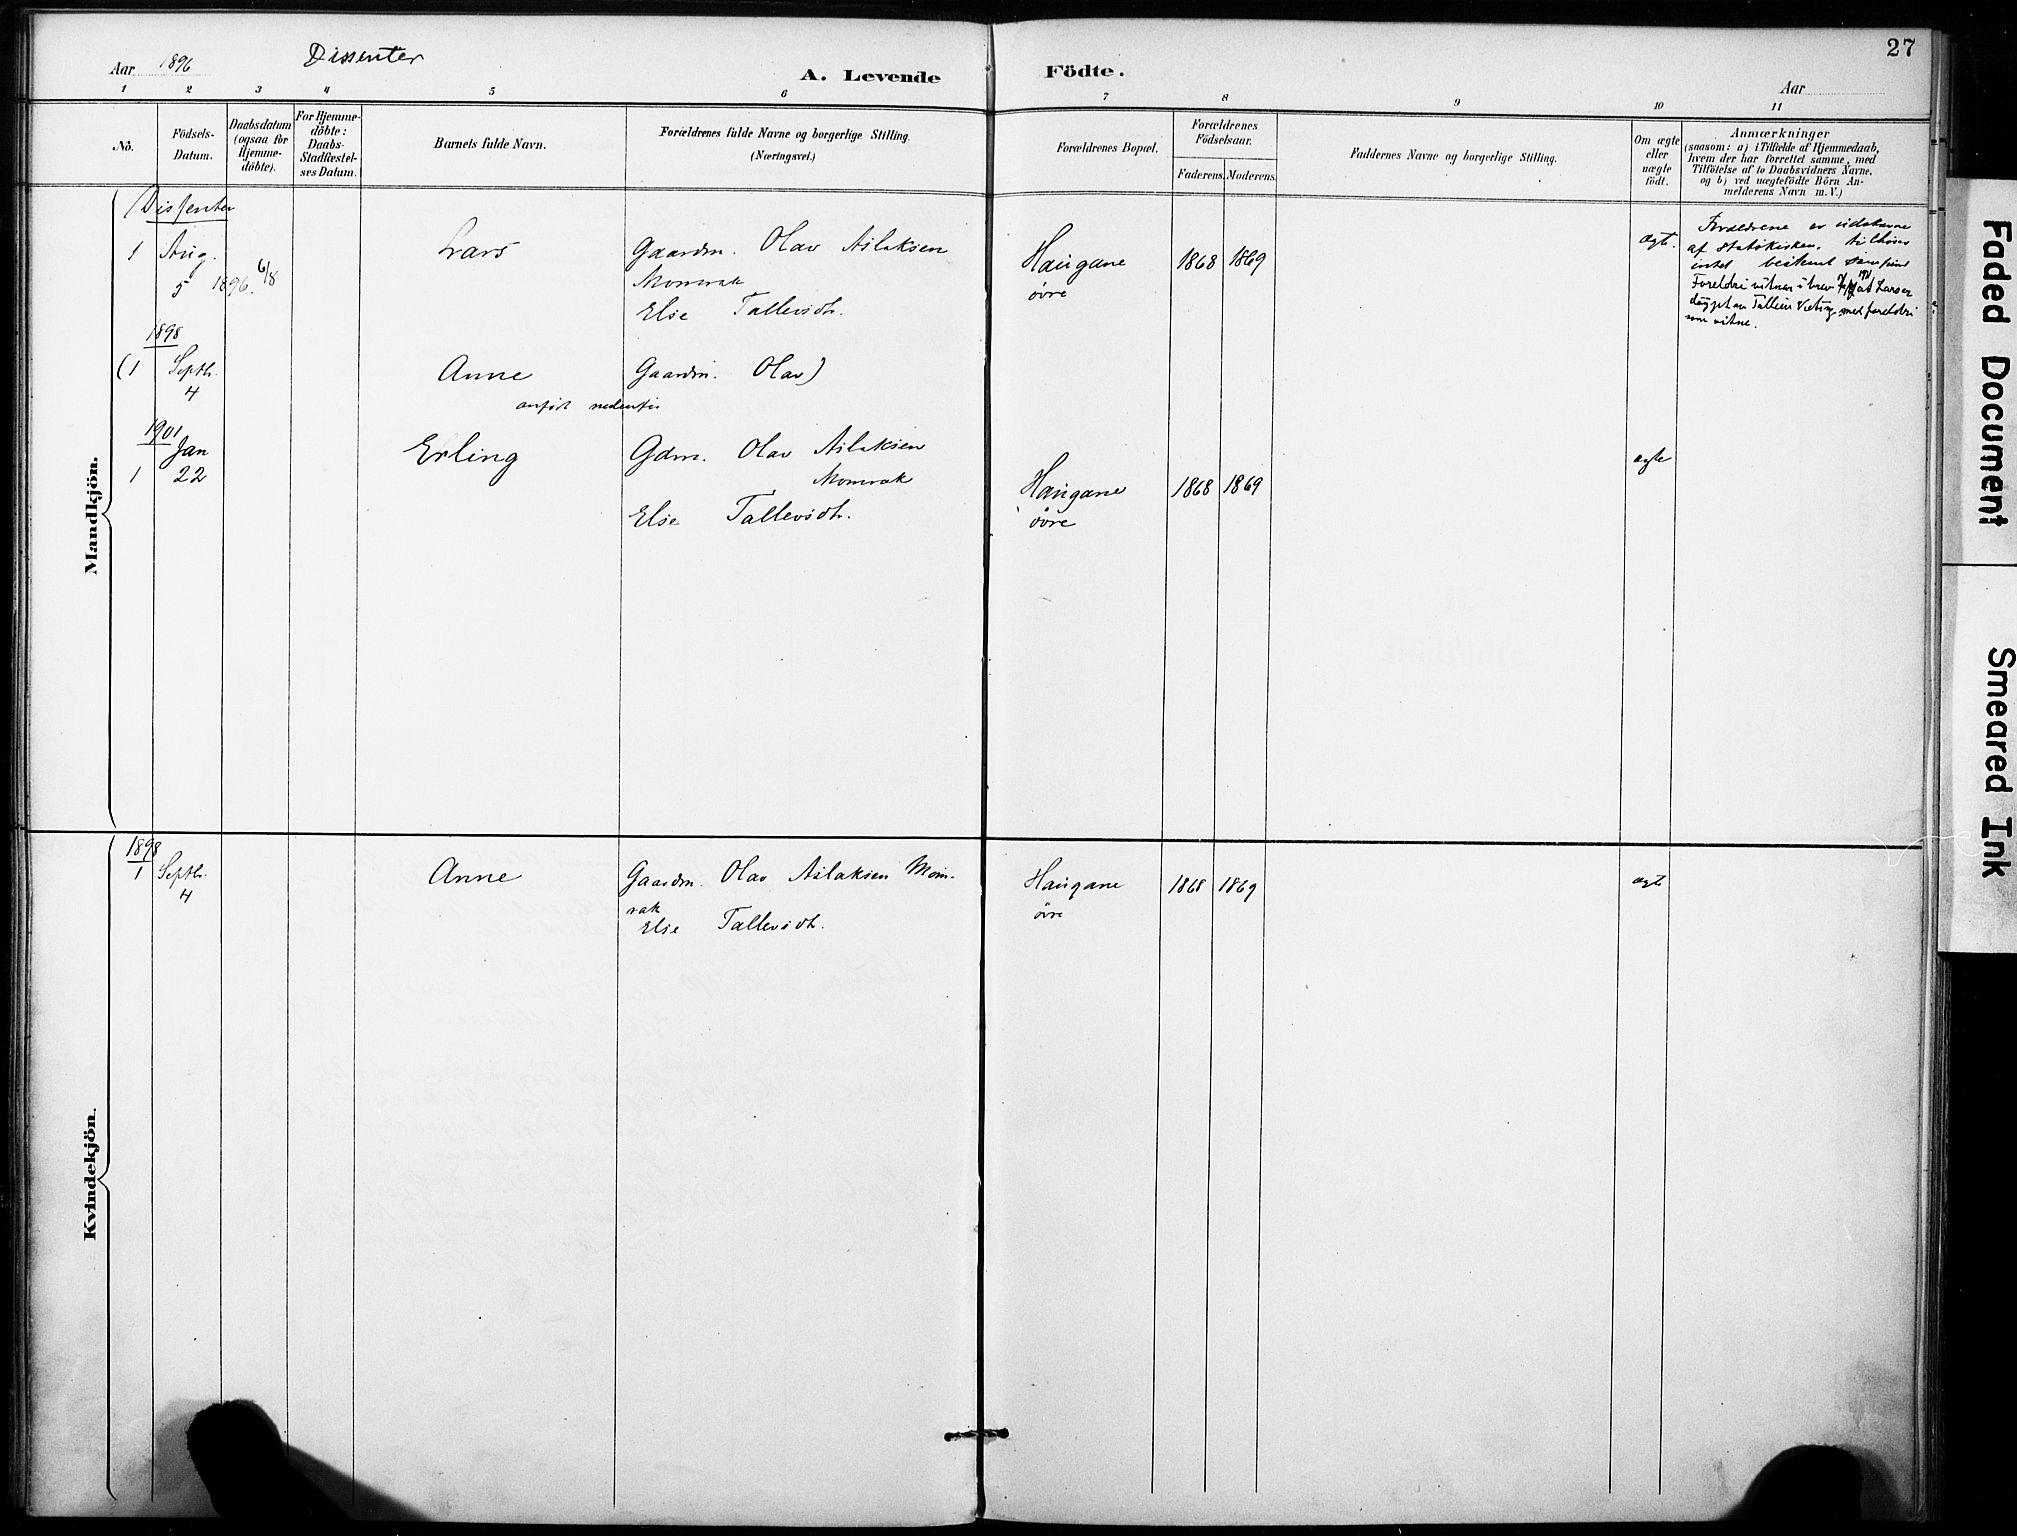 SAKO, Fyresdal kirkebøker, F/Fb/L0003: Parish register (official) no. II 3, 1887-1903, p. 27